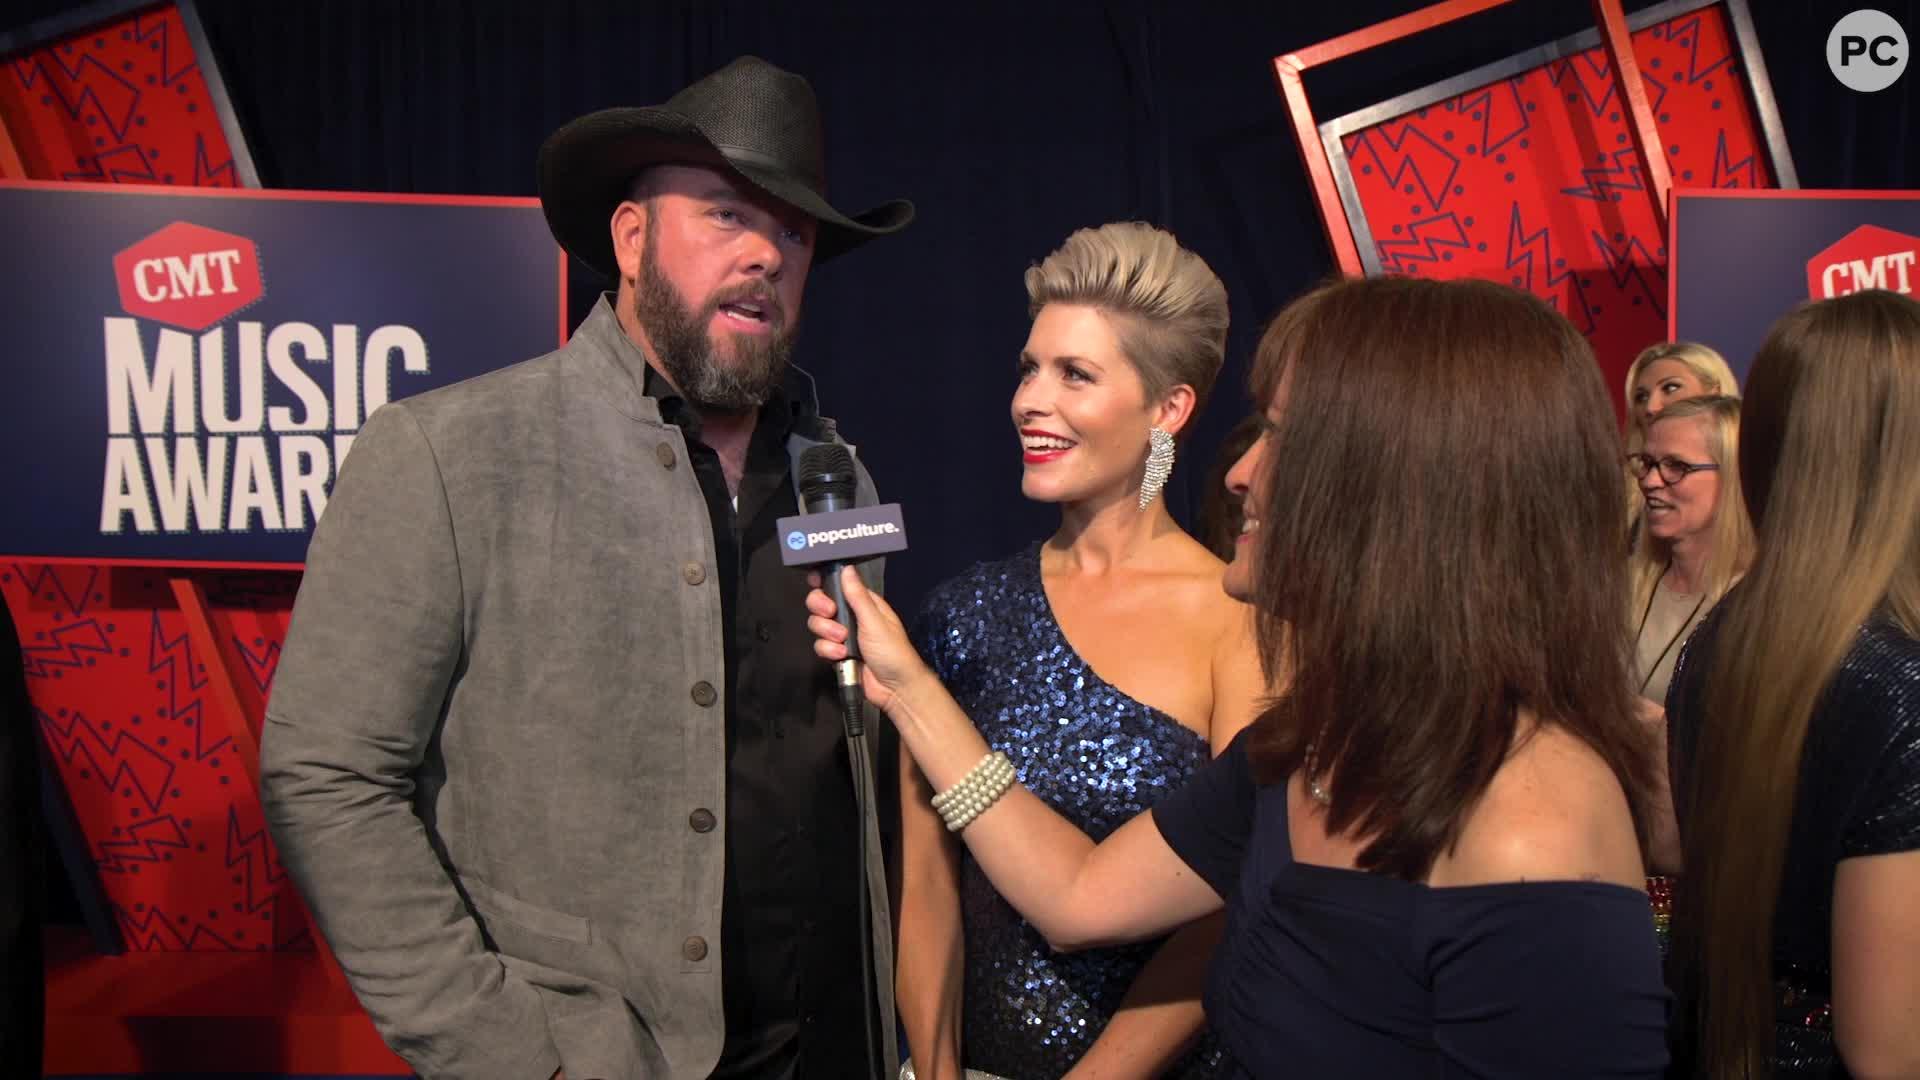 Chris Sullivan - 2019 CMT Awards Red Carpet Exclusive screen capture